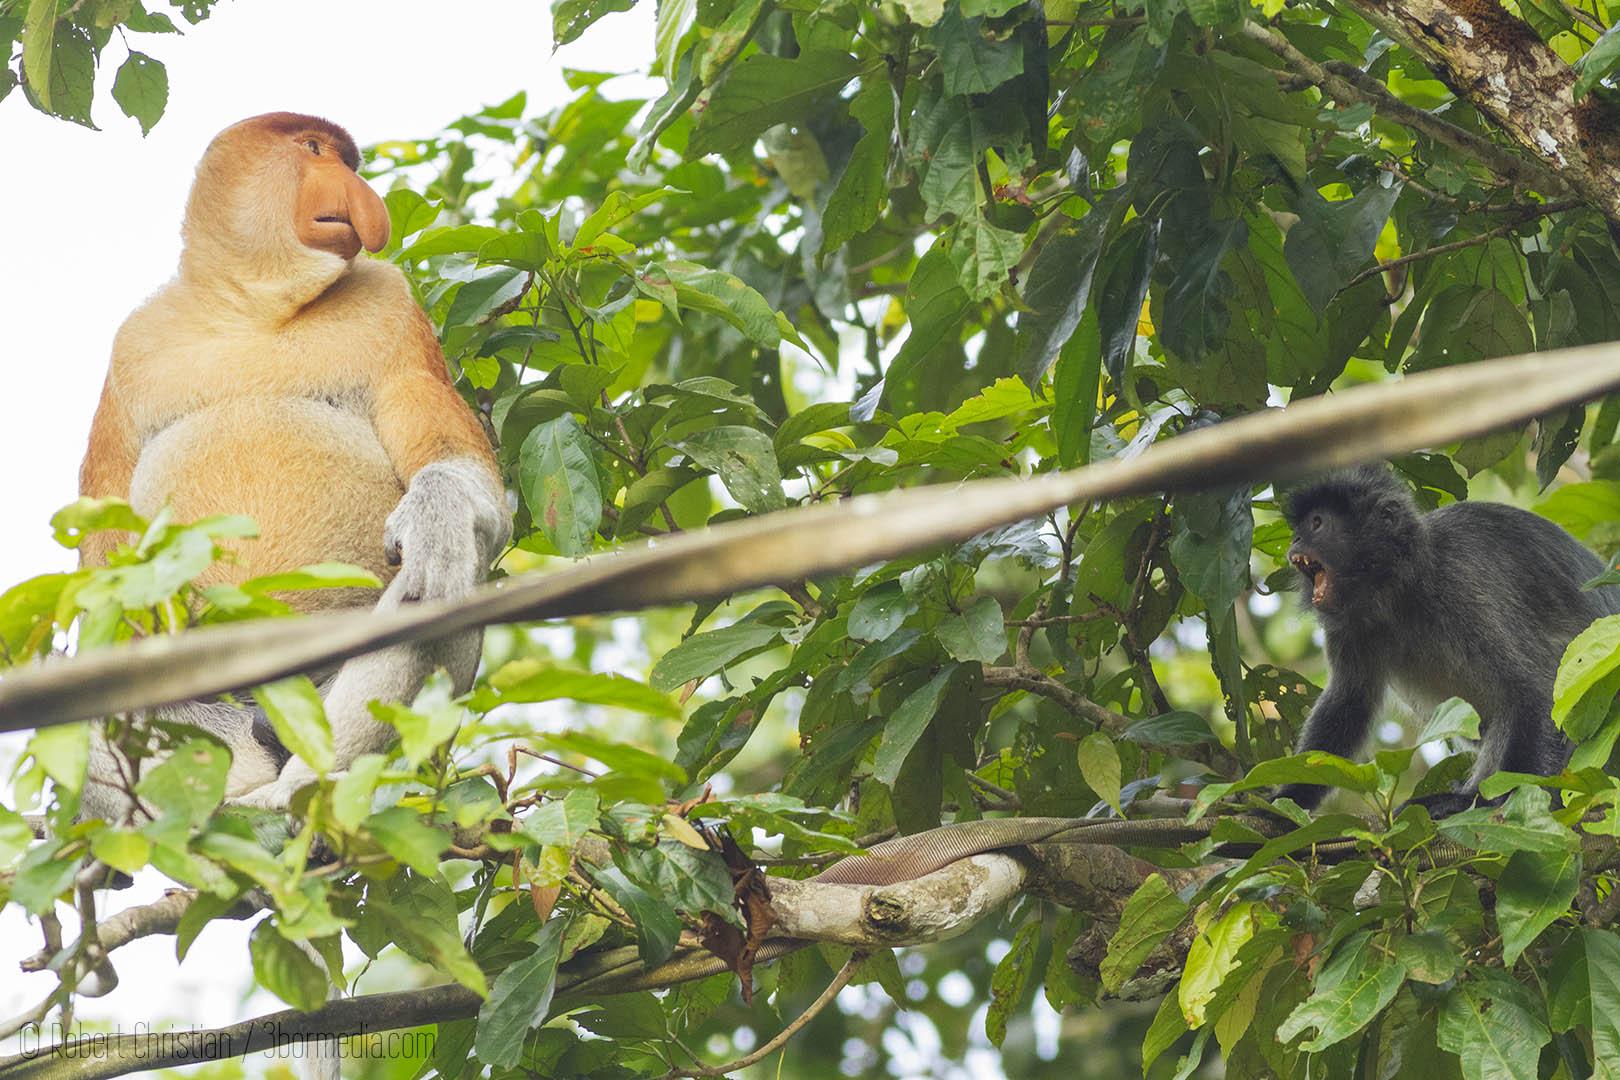 A Silver Leaf Monkey meets a large male Proboscis Monkey on an Orangutan Bridge